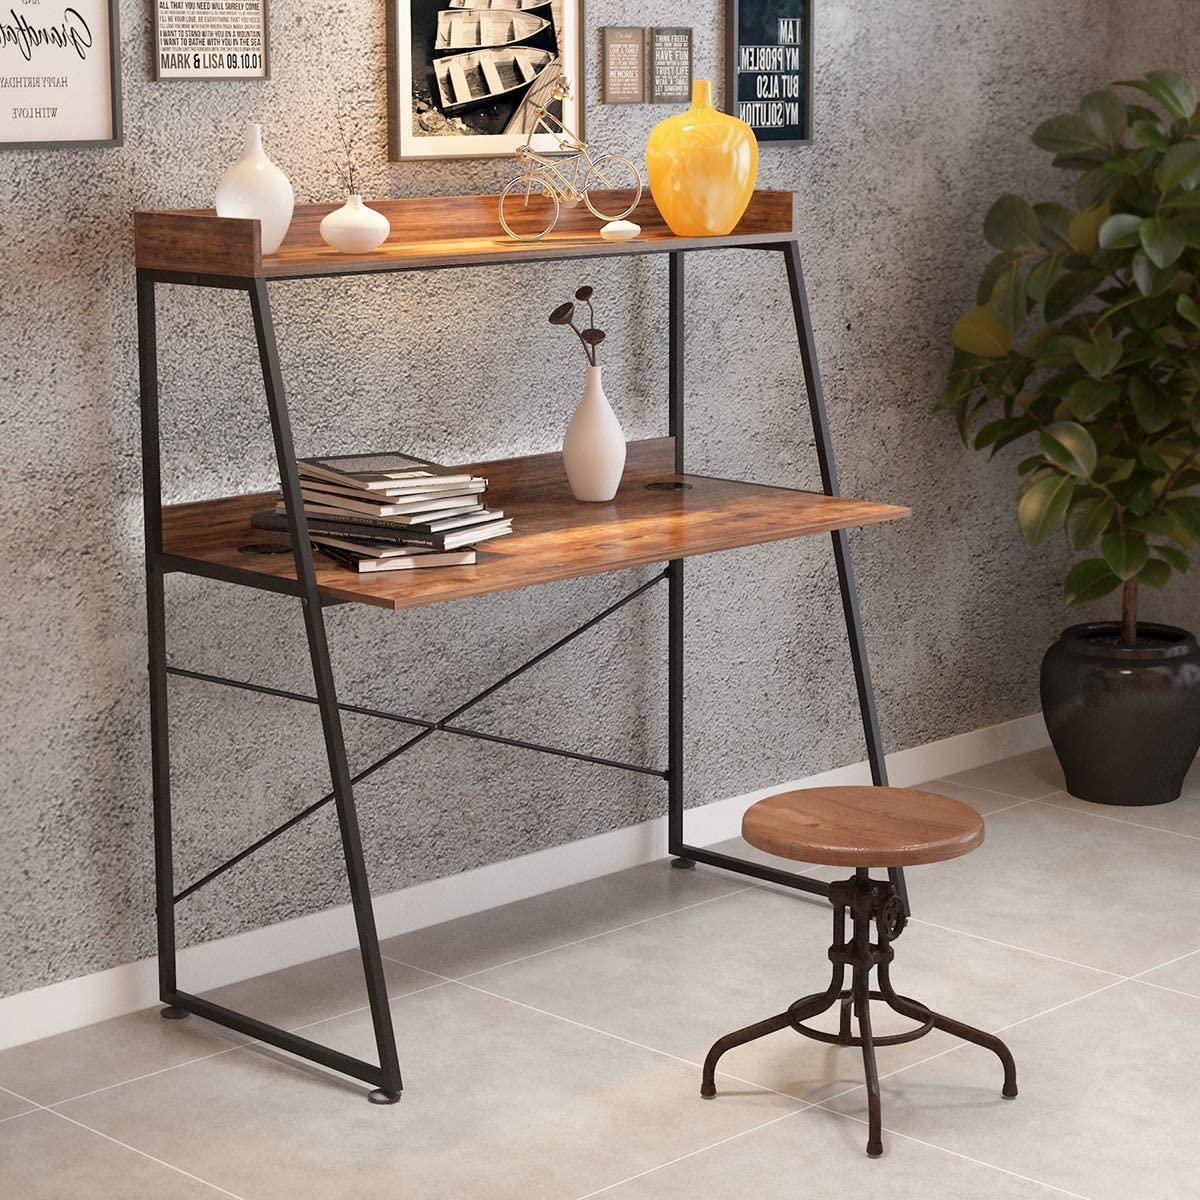 Designa desk shelf amazon